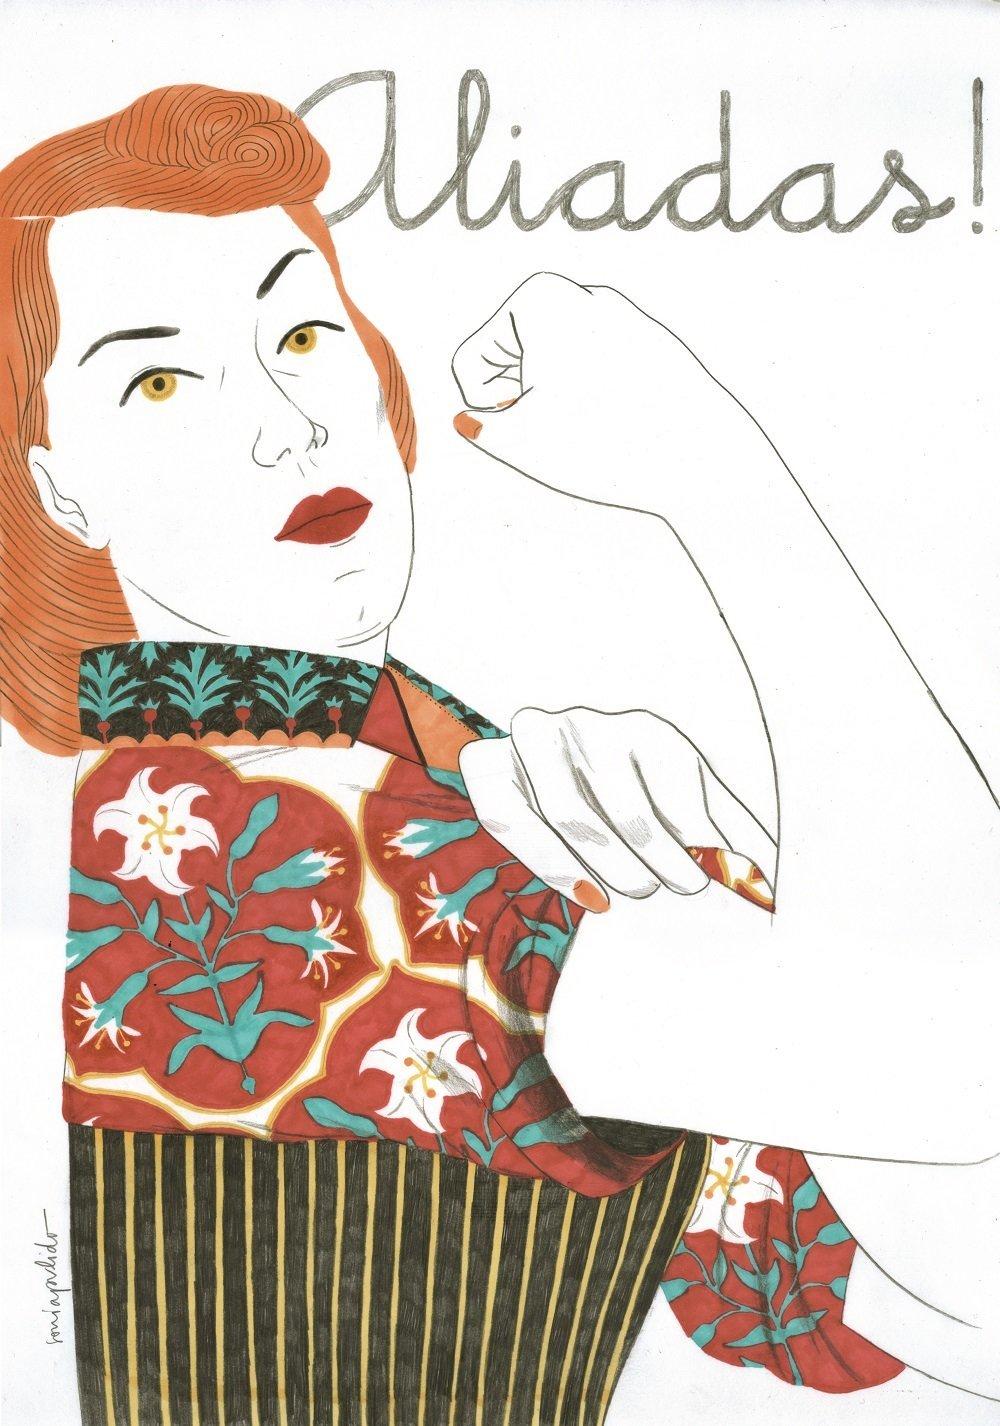 "<a href=""http://soniapulido.blogspot.com.es/"" target=""_blank"">Sonia Pulido</a>"